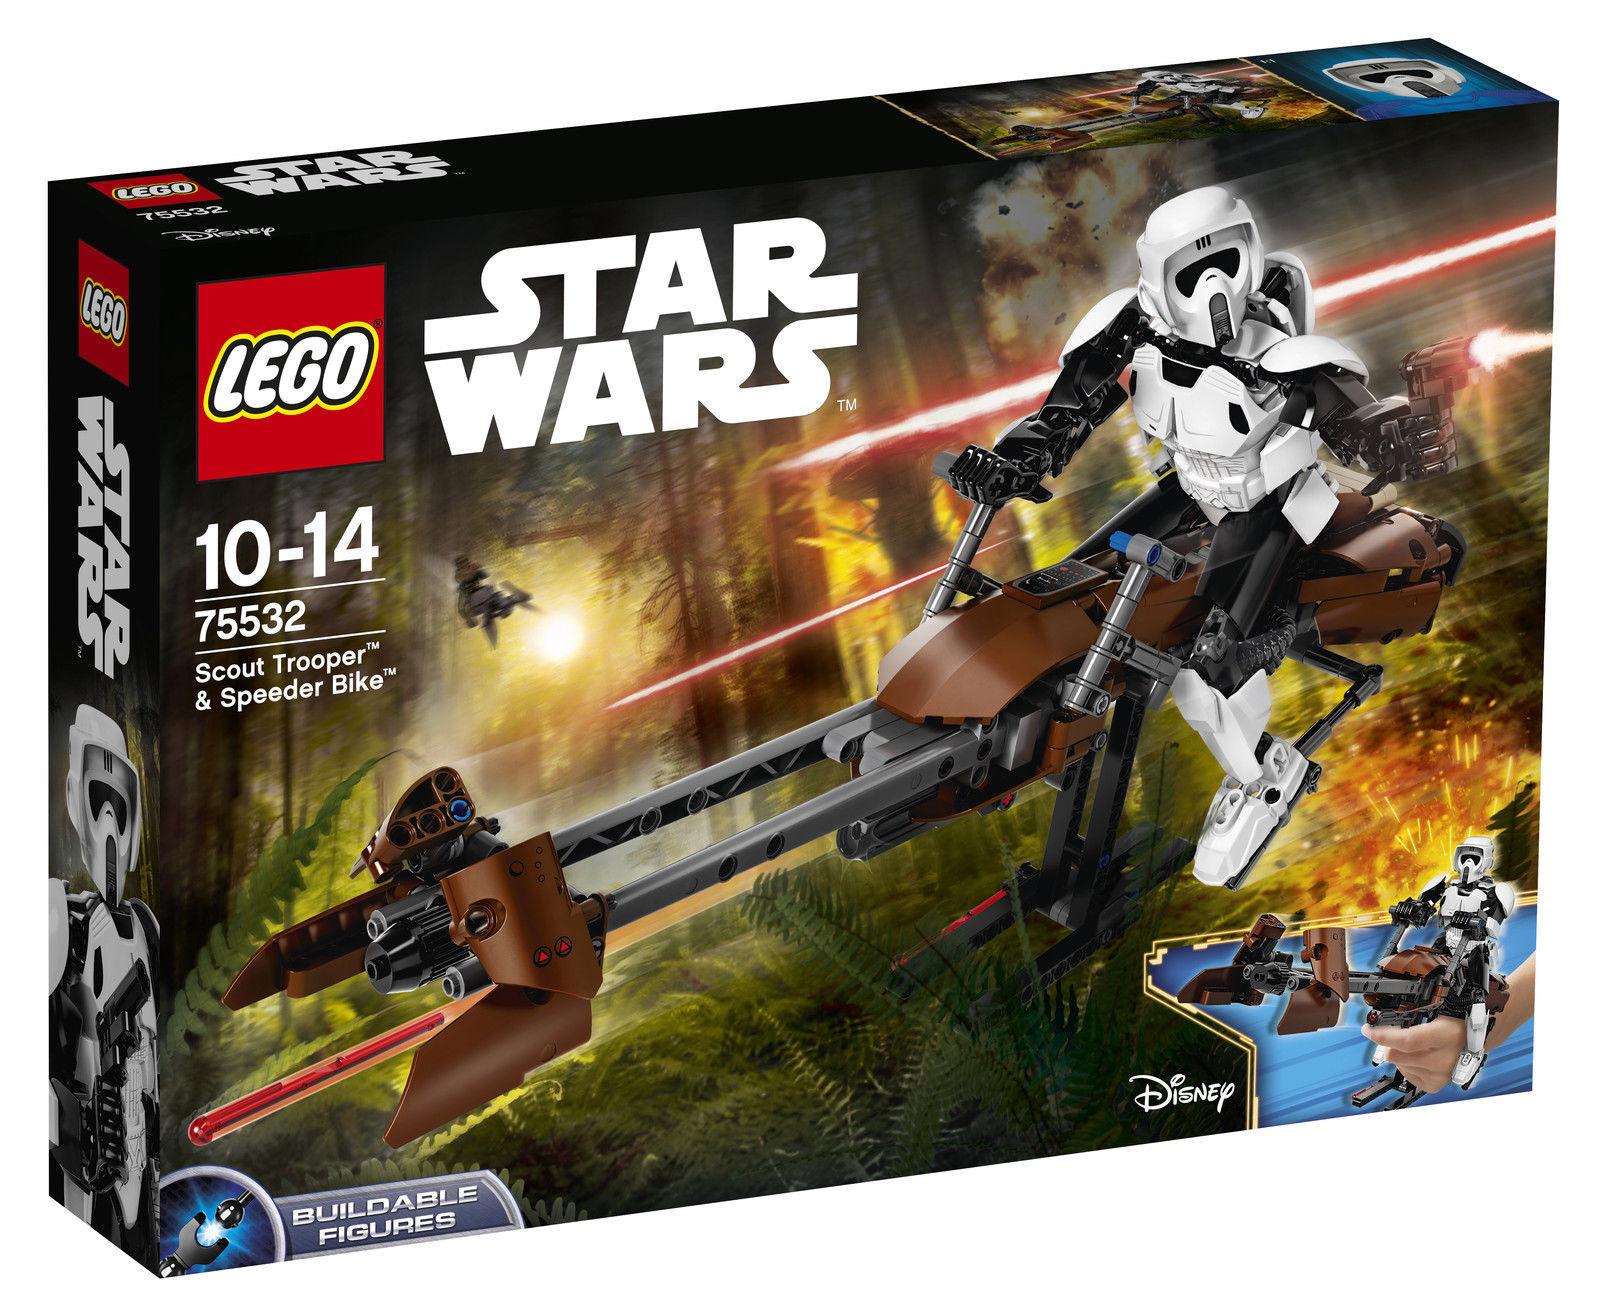 LEGO LEGO LEGO Star Wars Scout Trooper & Speeder Bike 2017 (75532) NEW b706cf